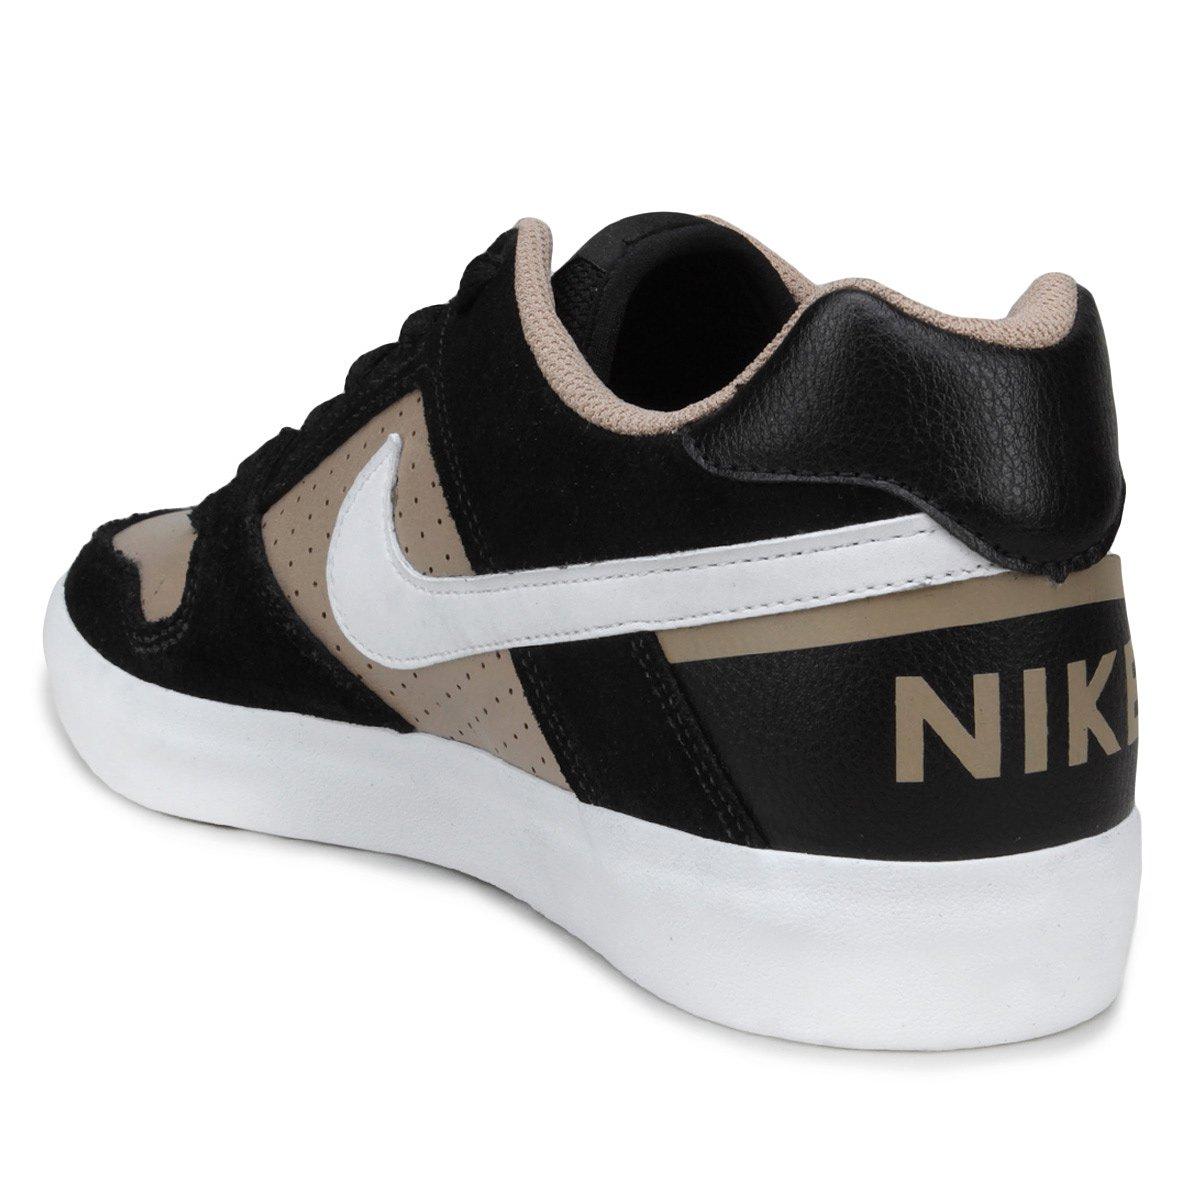 ... Tênis Nike SB Delta Force Vulc Masculino - Bege e Preto - Compre . 5b3f08484a7